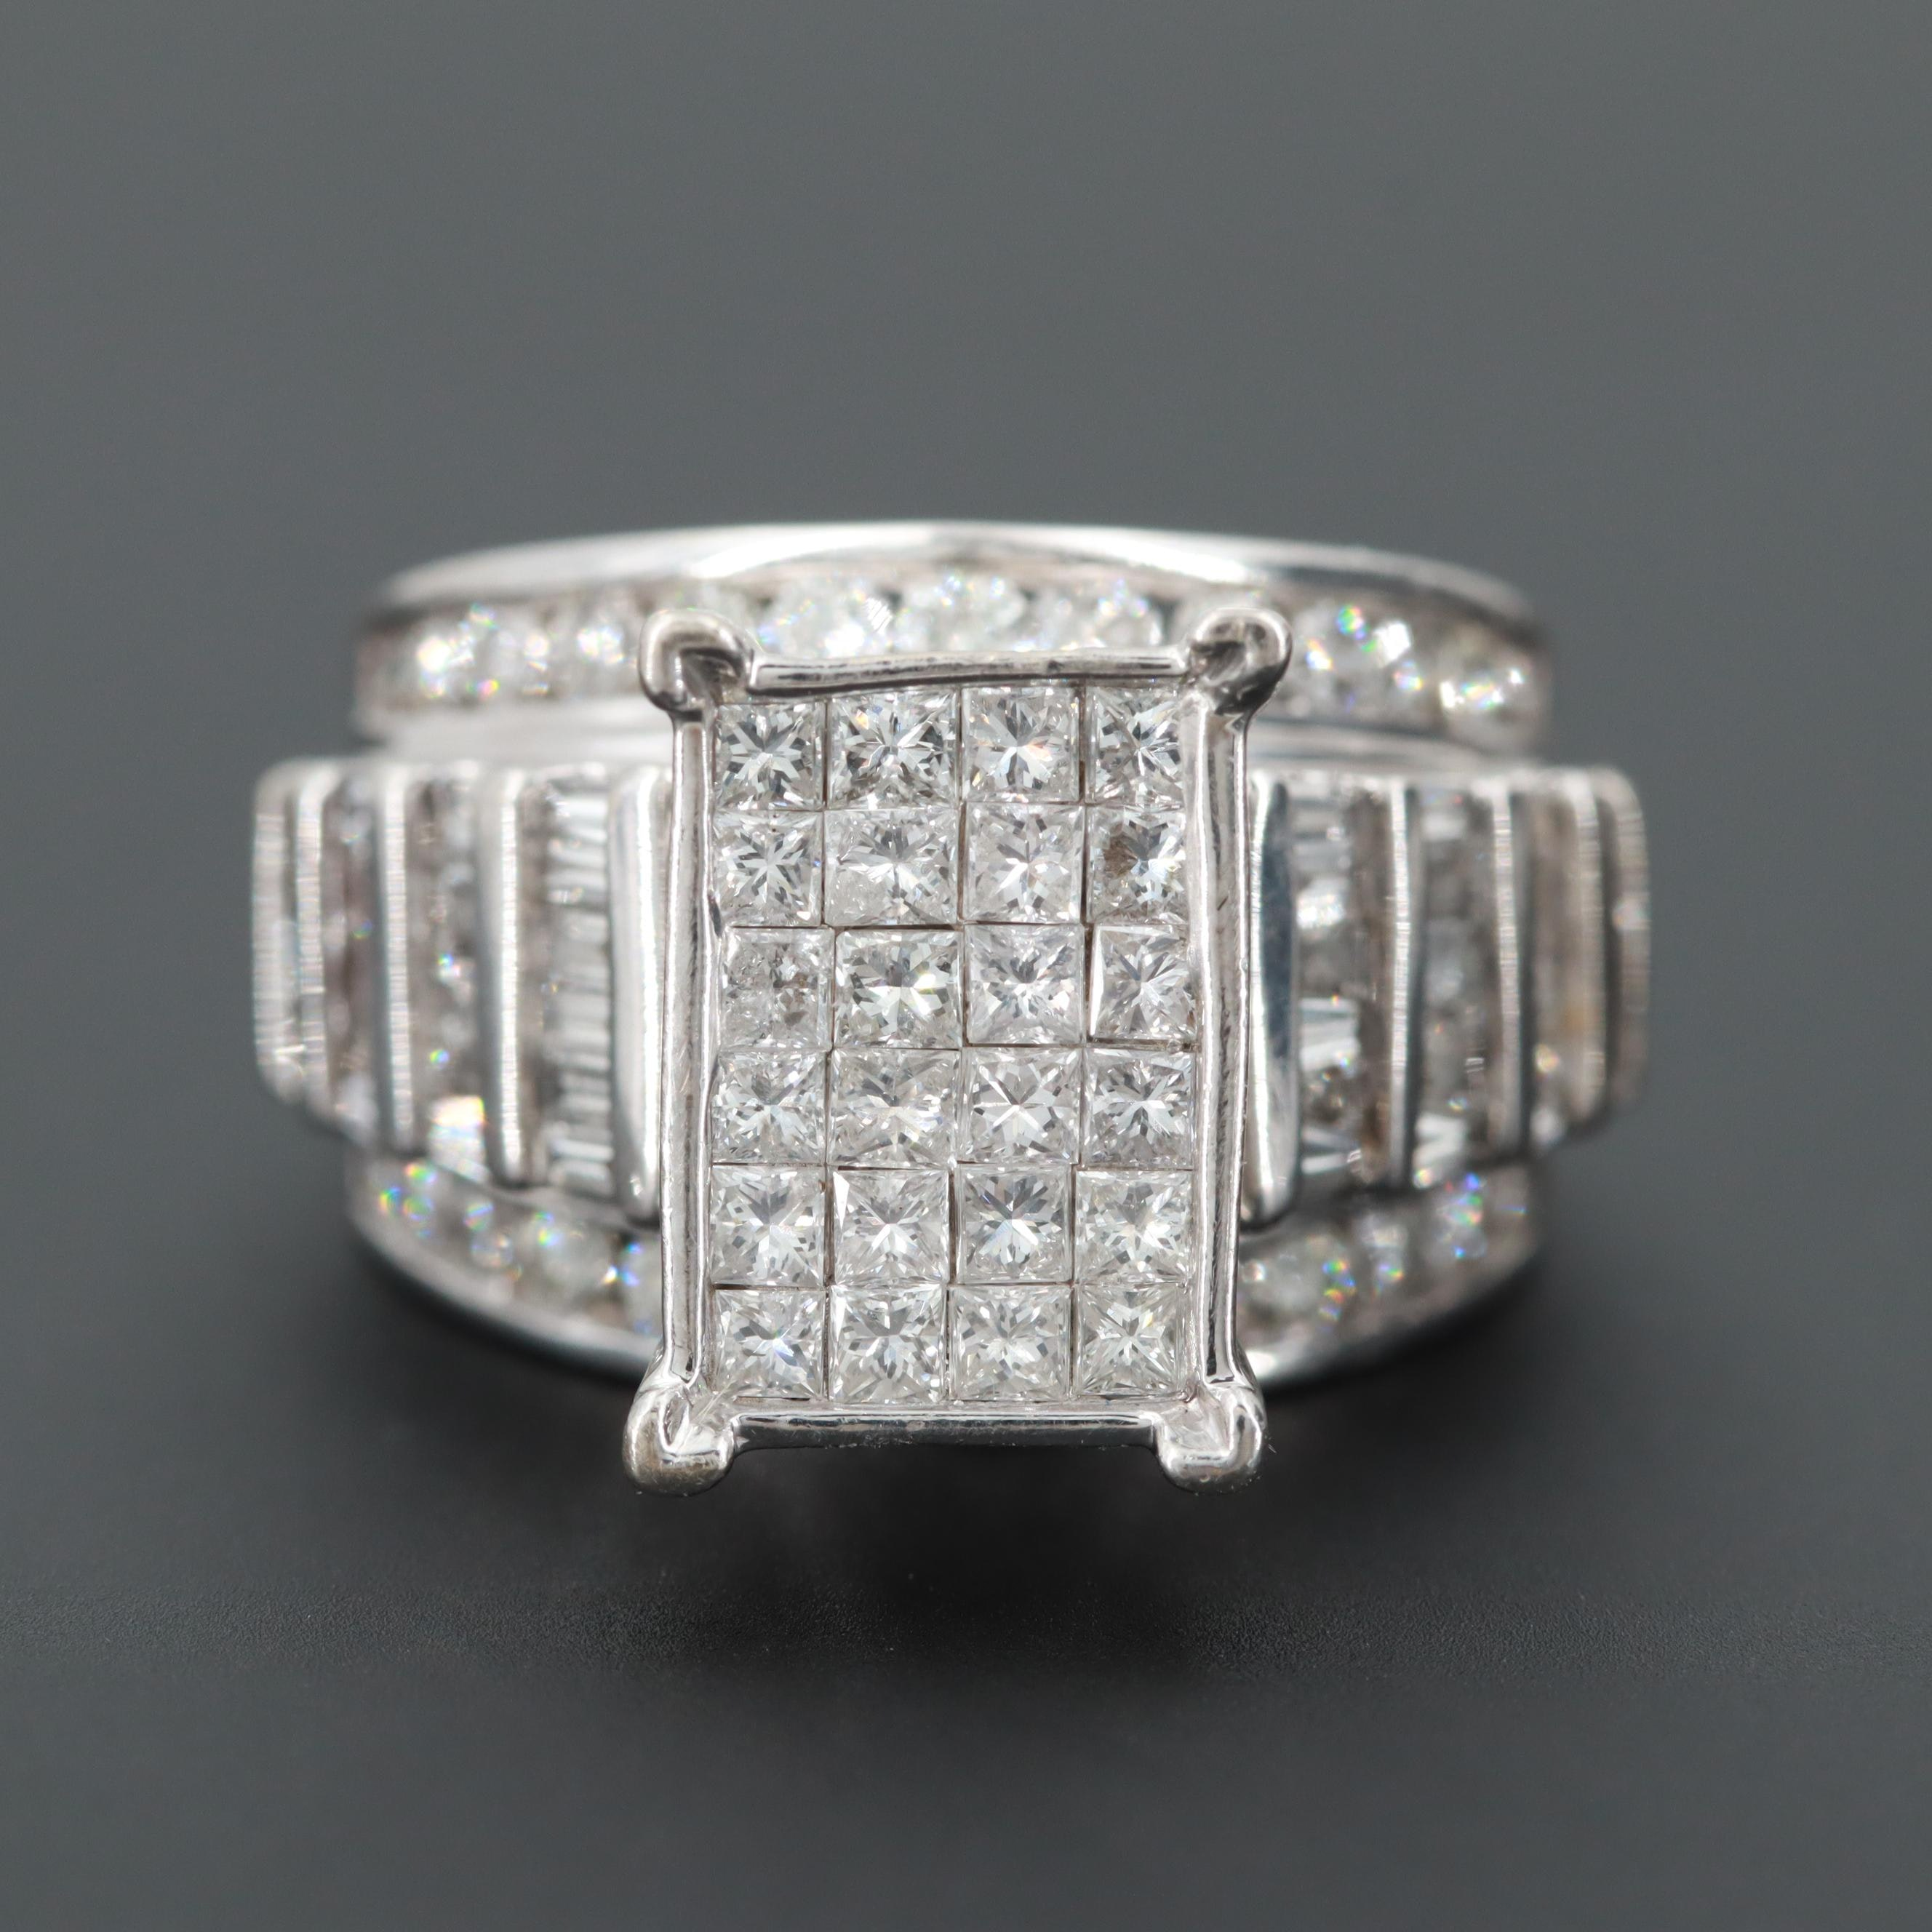 10K White Gold 2.12 CTW Diamond Ring